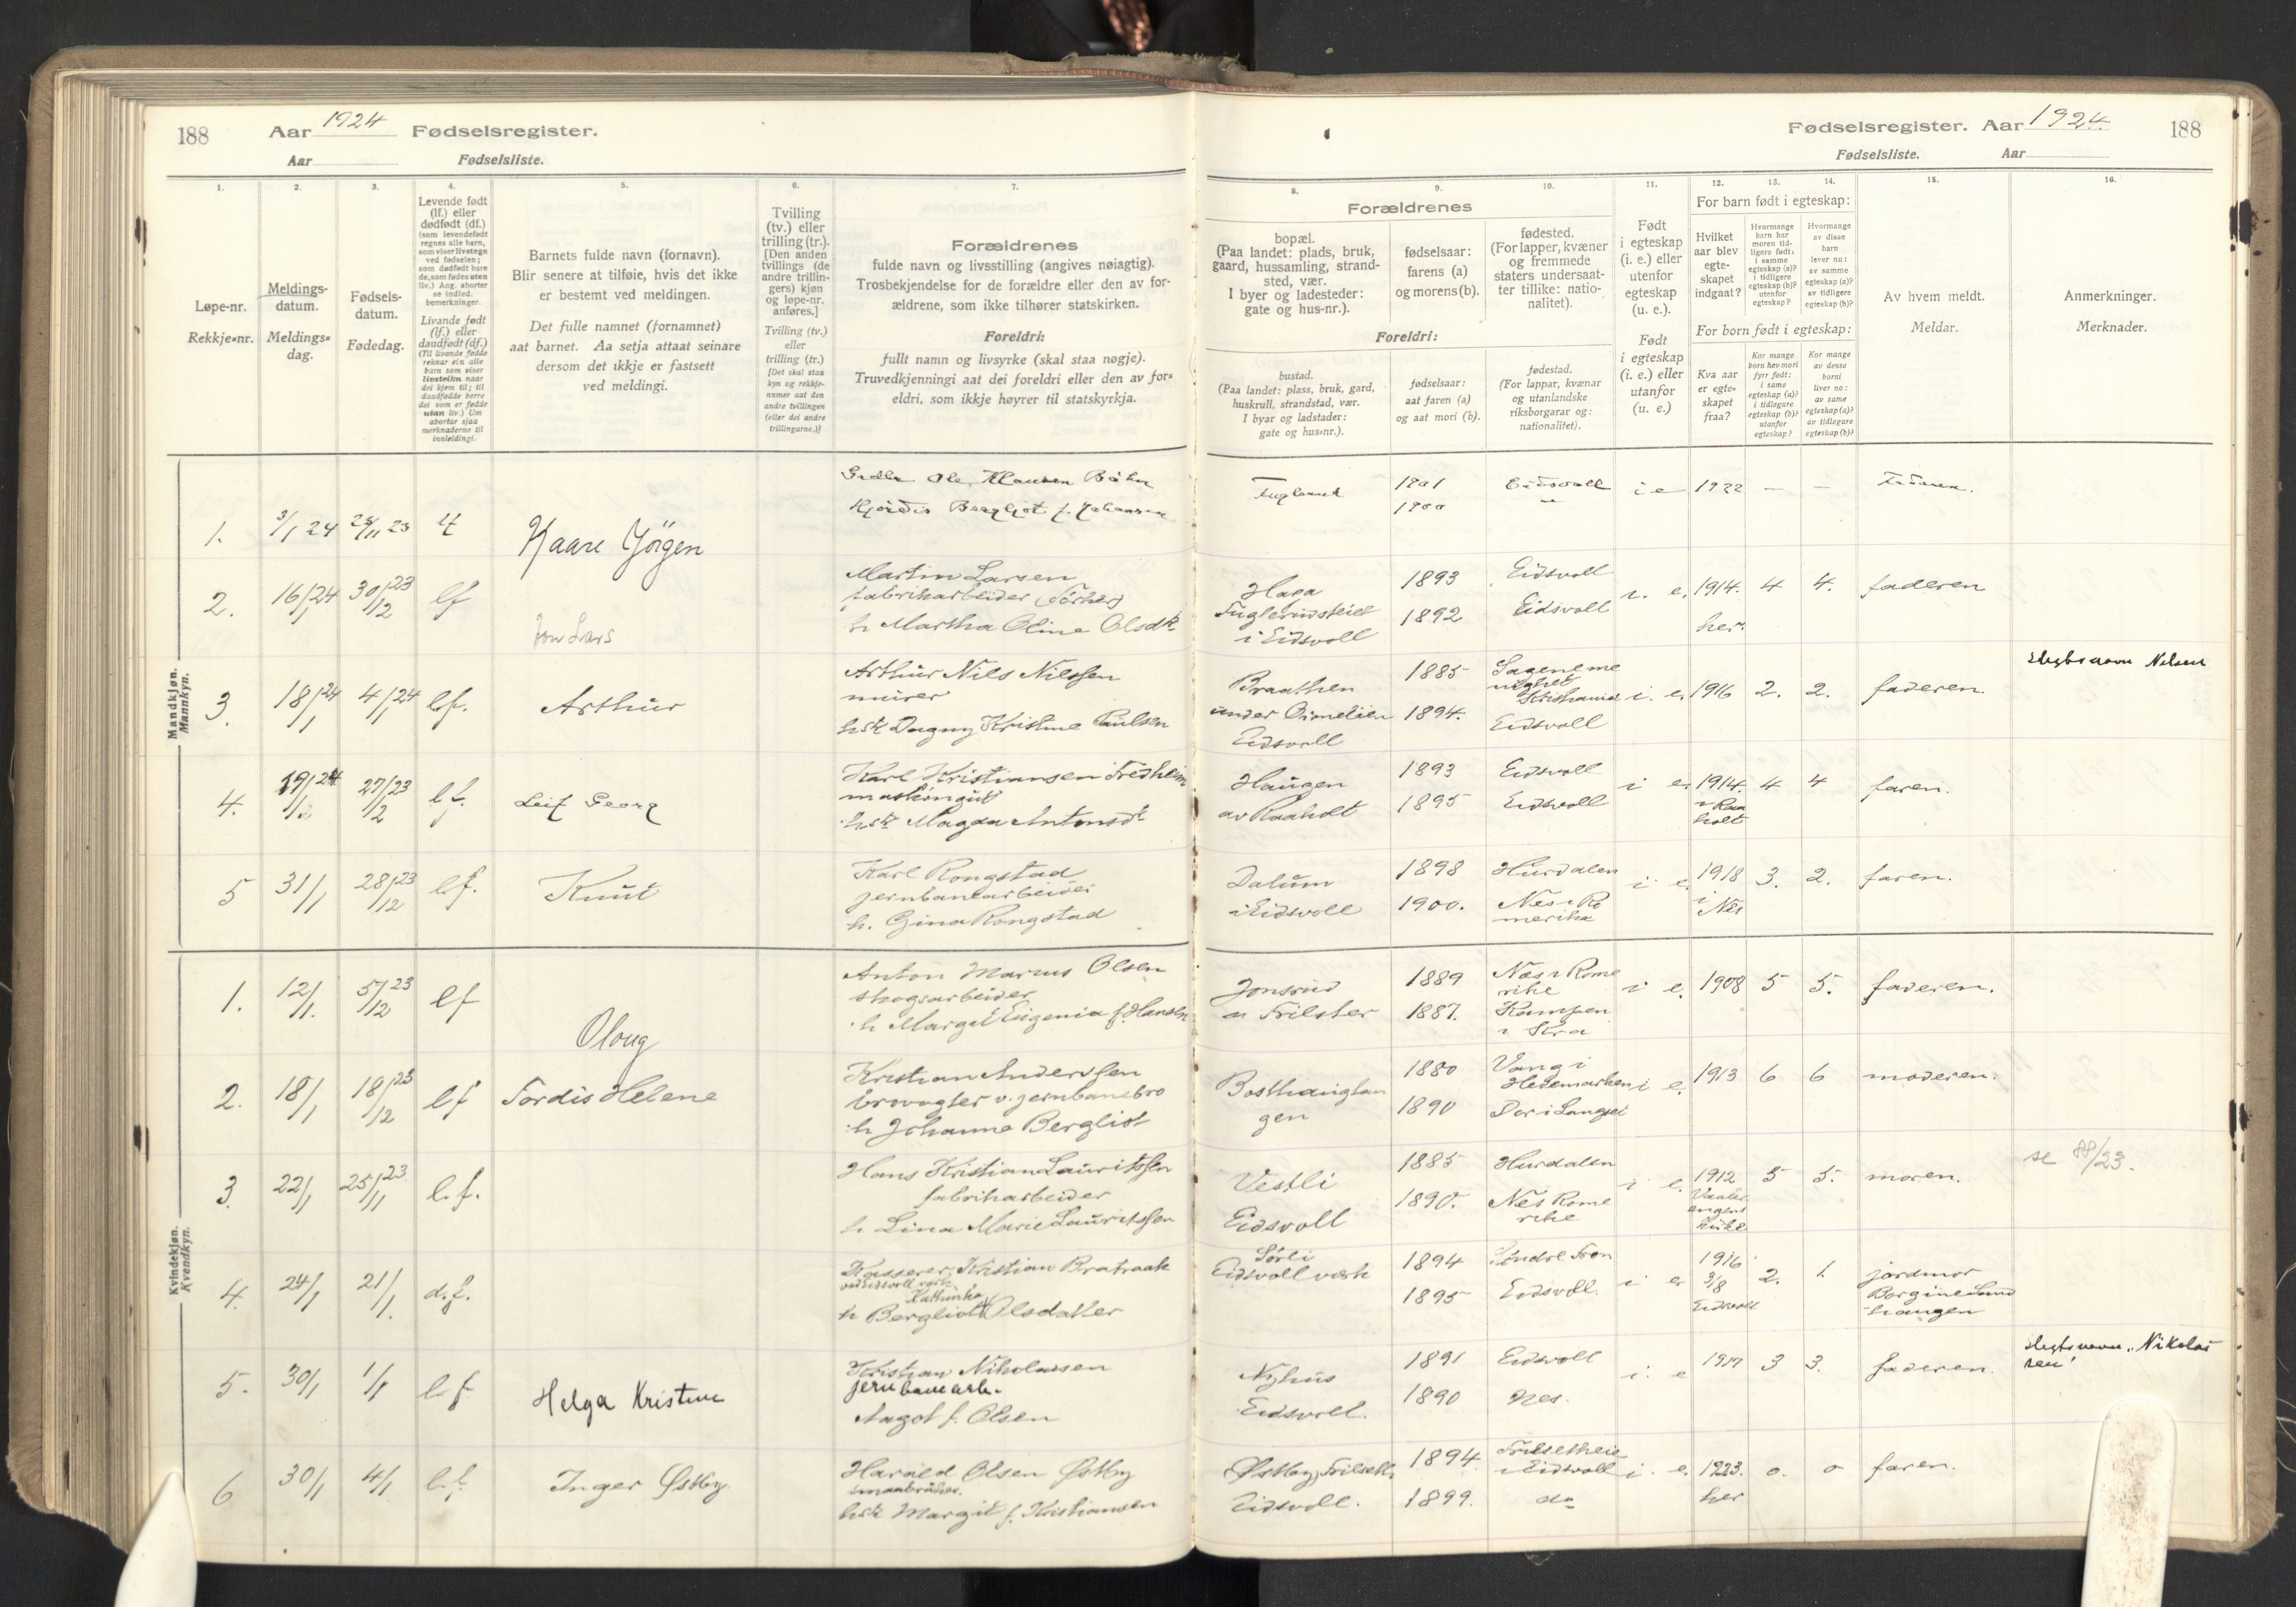 SAO, Eidsvoll prestekontor Kirkebøker, Birth register no. I 1, 1916-1924, p. 188